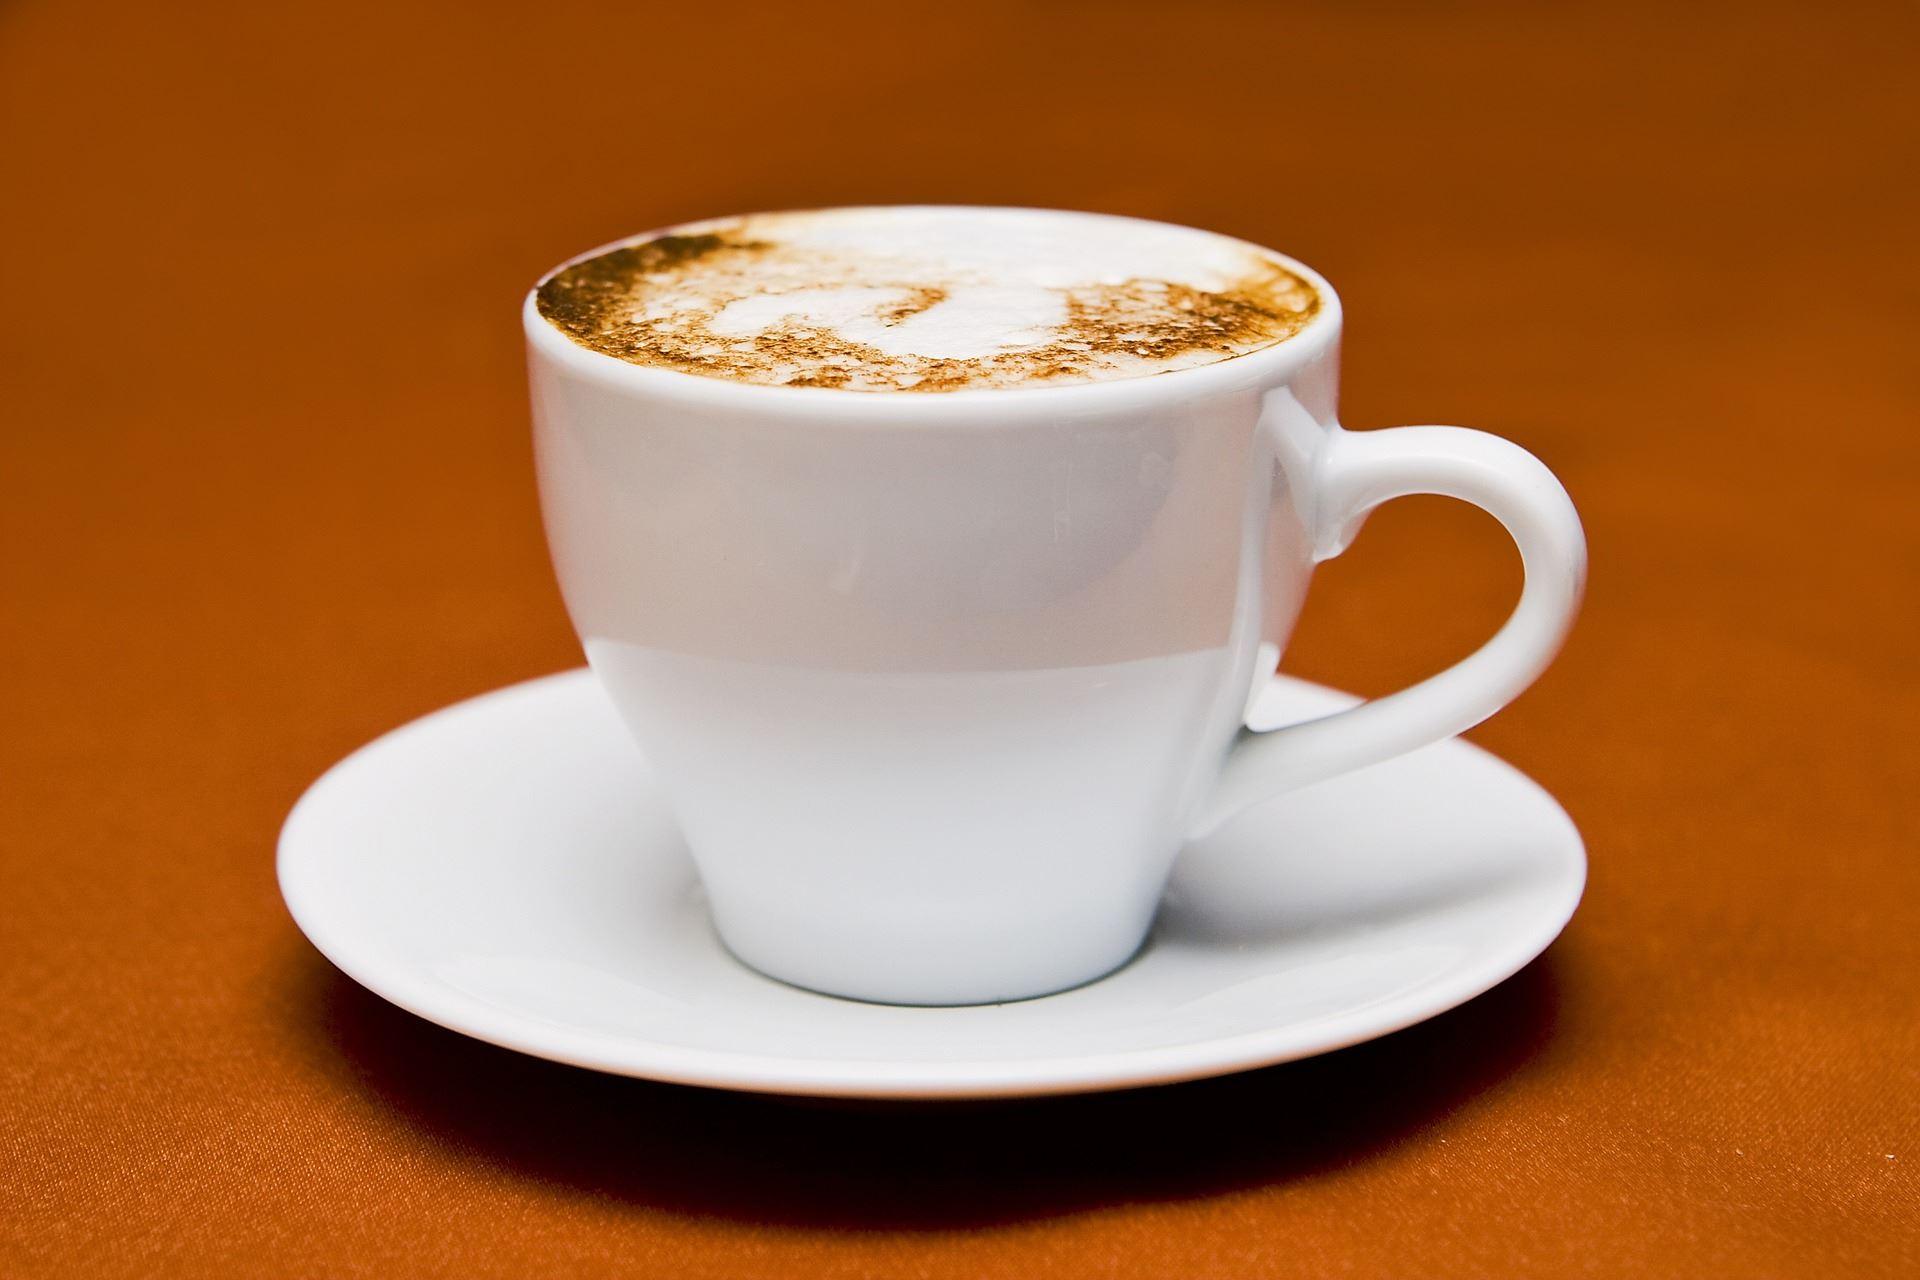 Galleri Hultman Kaffestuga